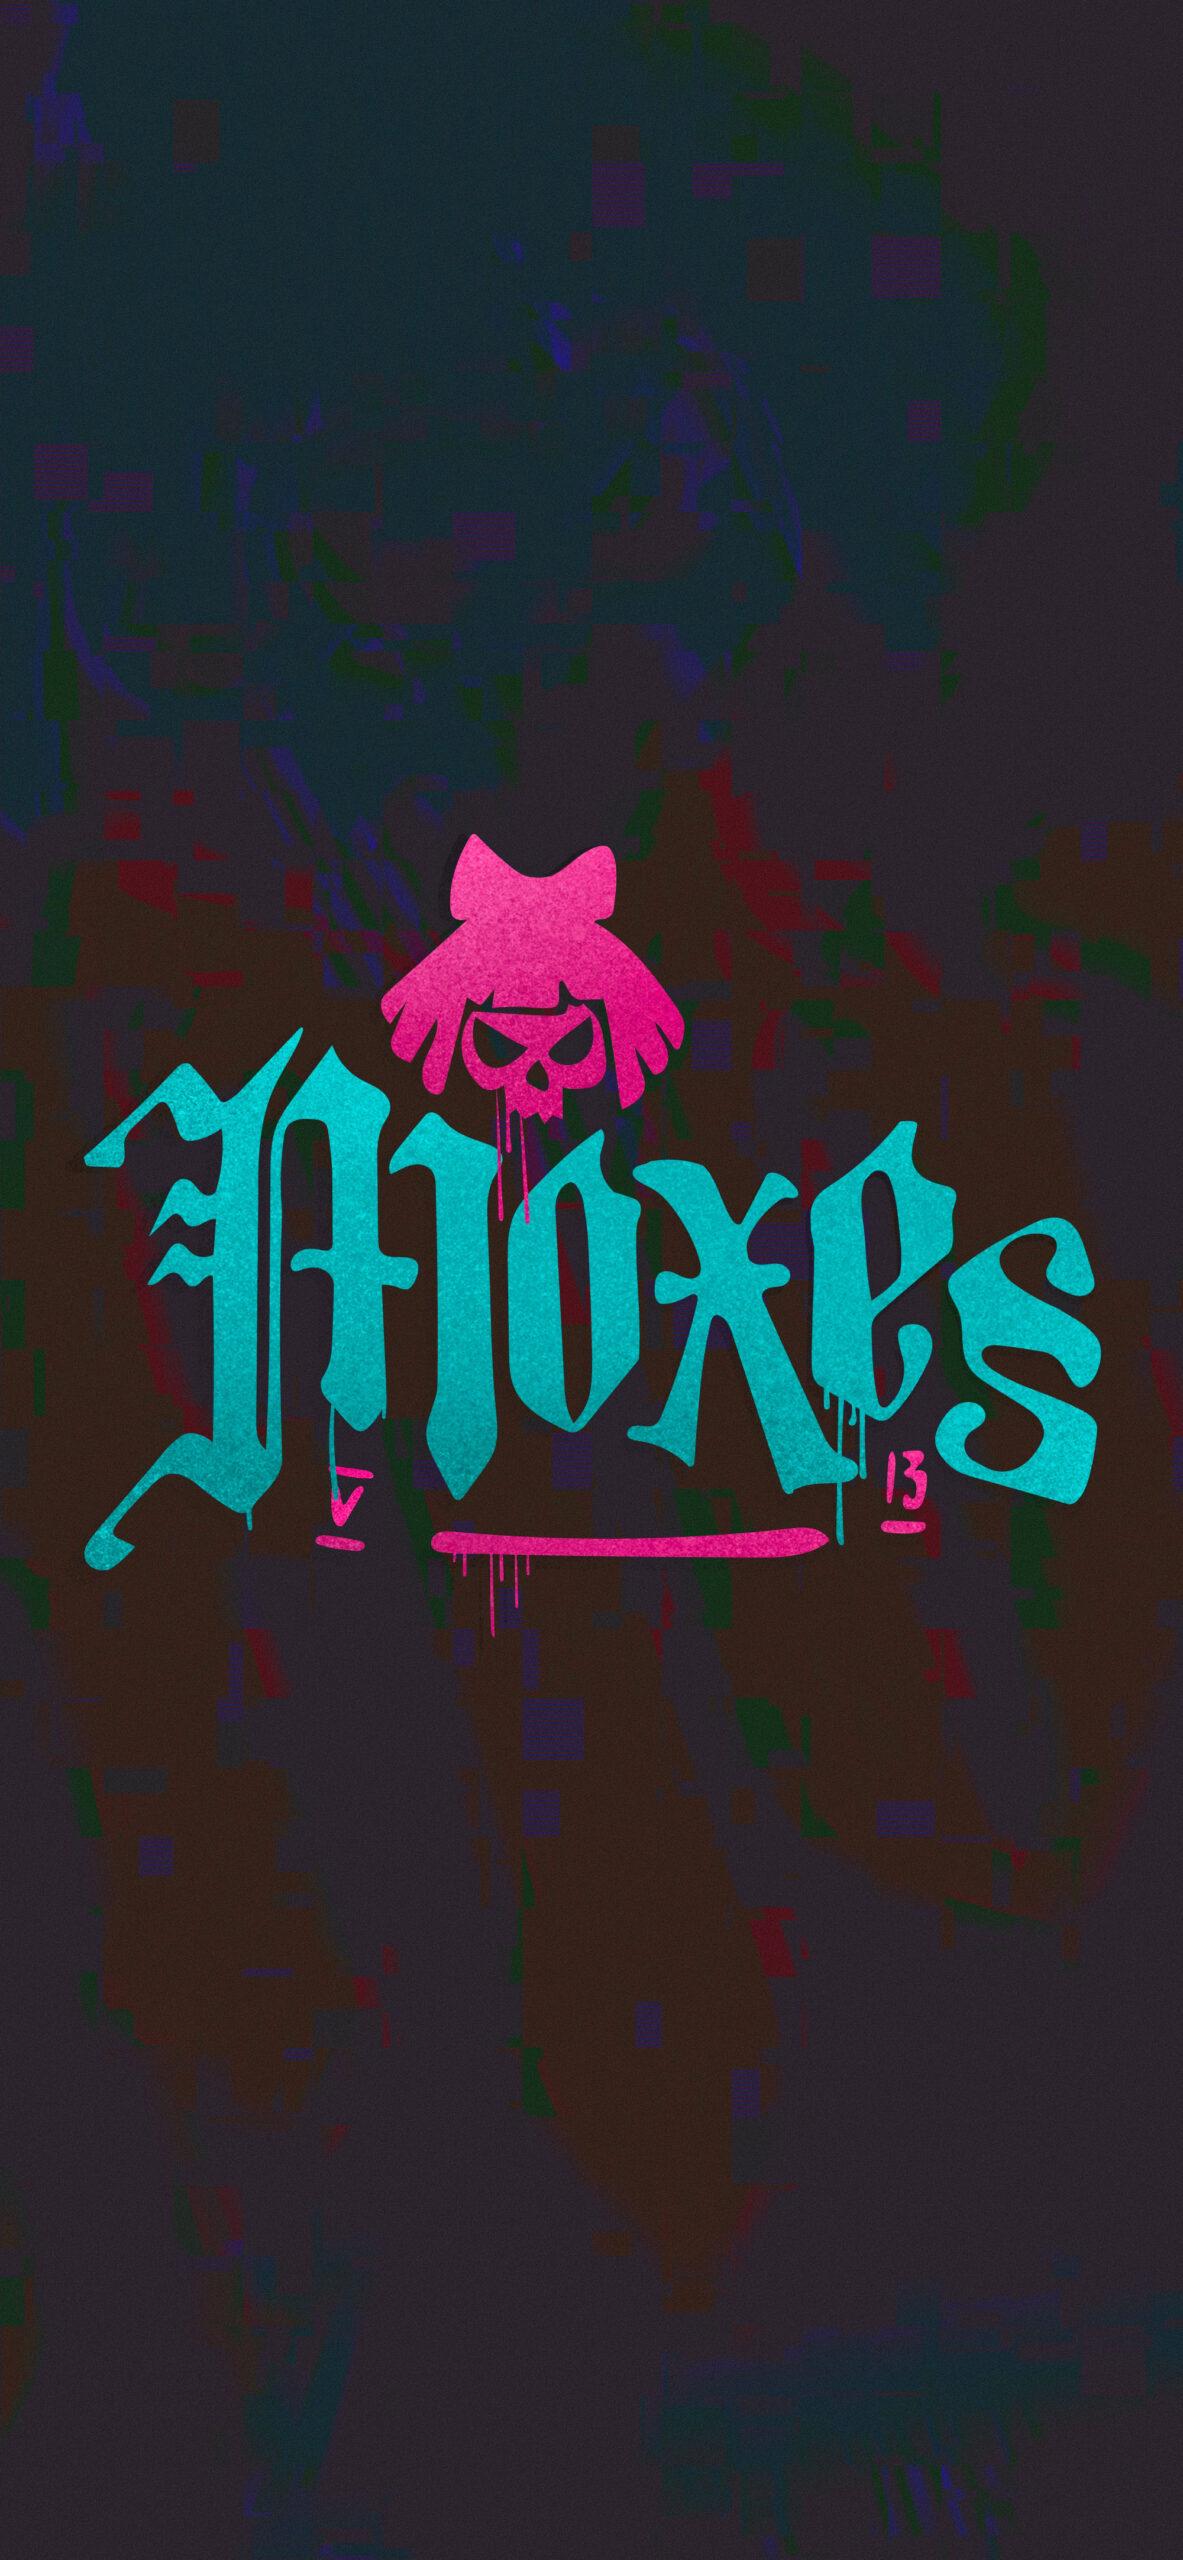 cyberpunk 2077 moxes logo glitch dark wallpaper